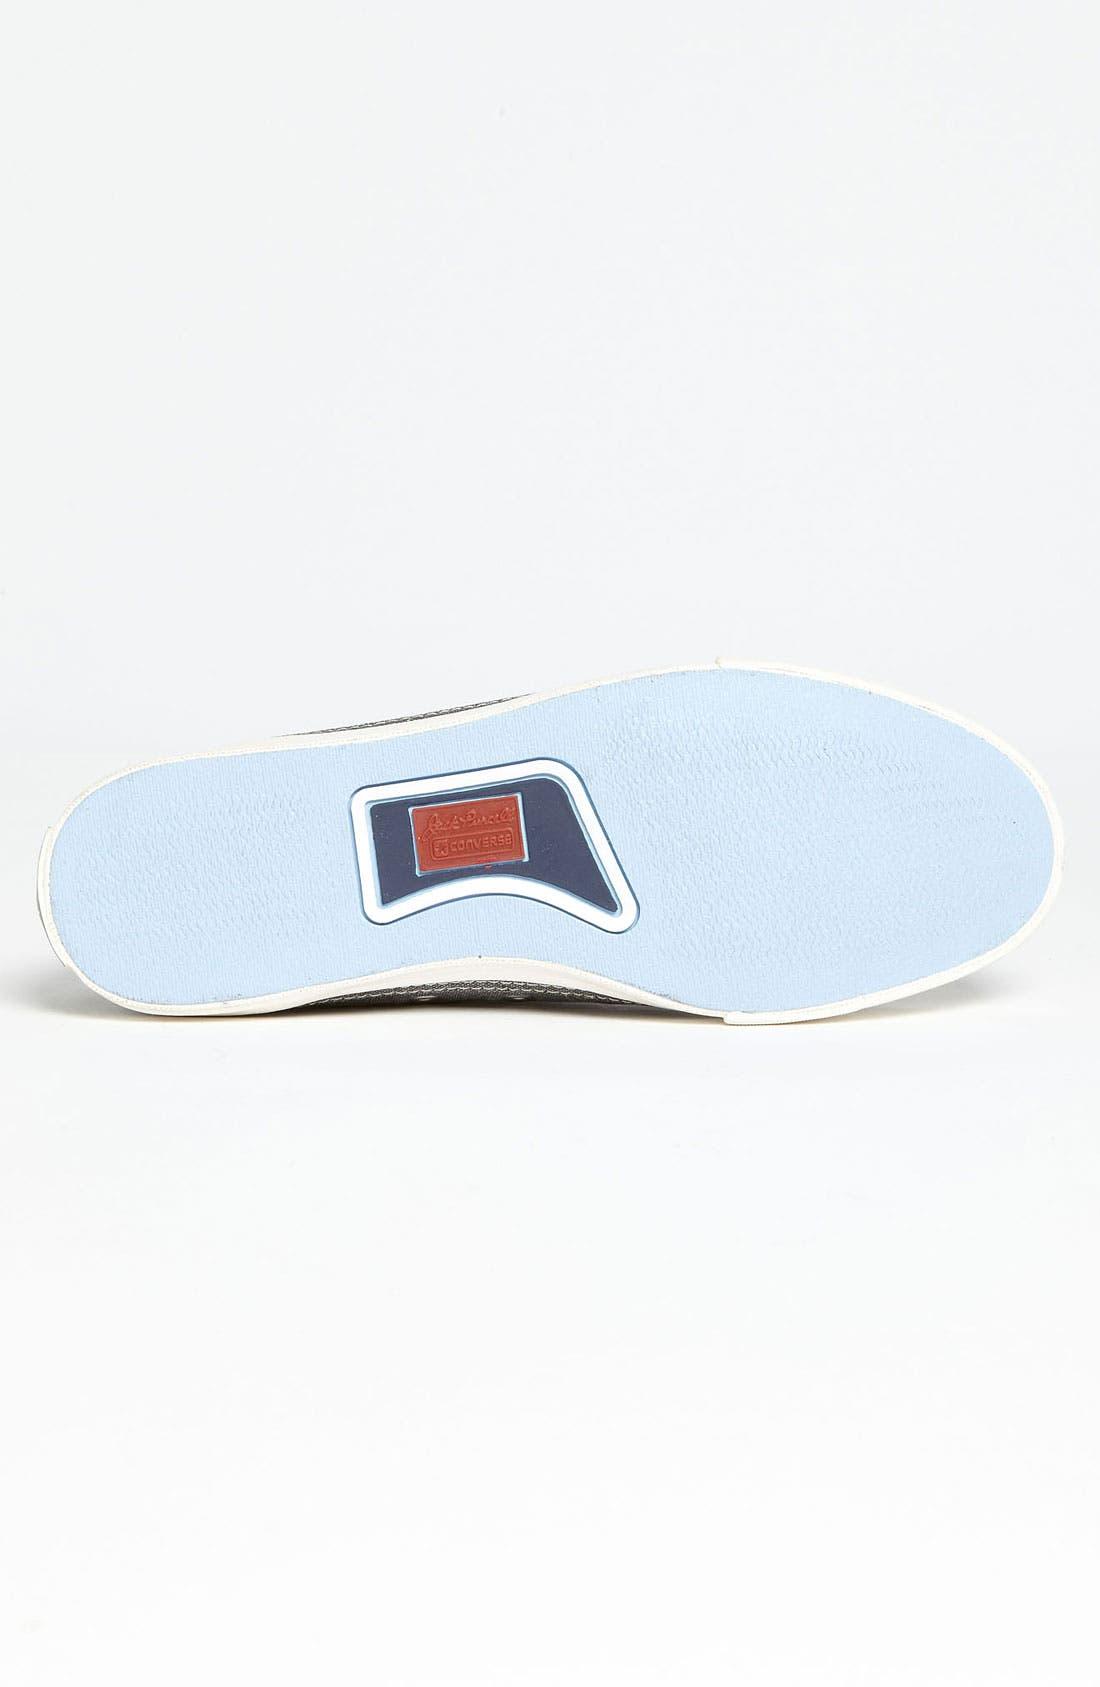 'Jack Purcell LP' Sneaker,                             Alternate thumbnail 4, color,                             Navy